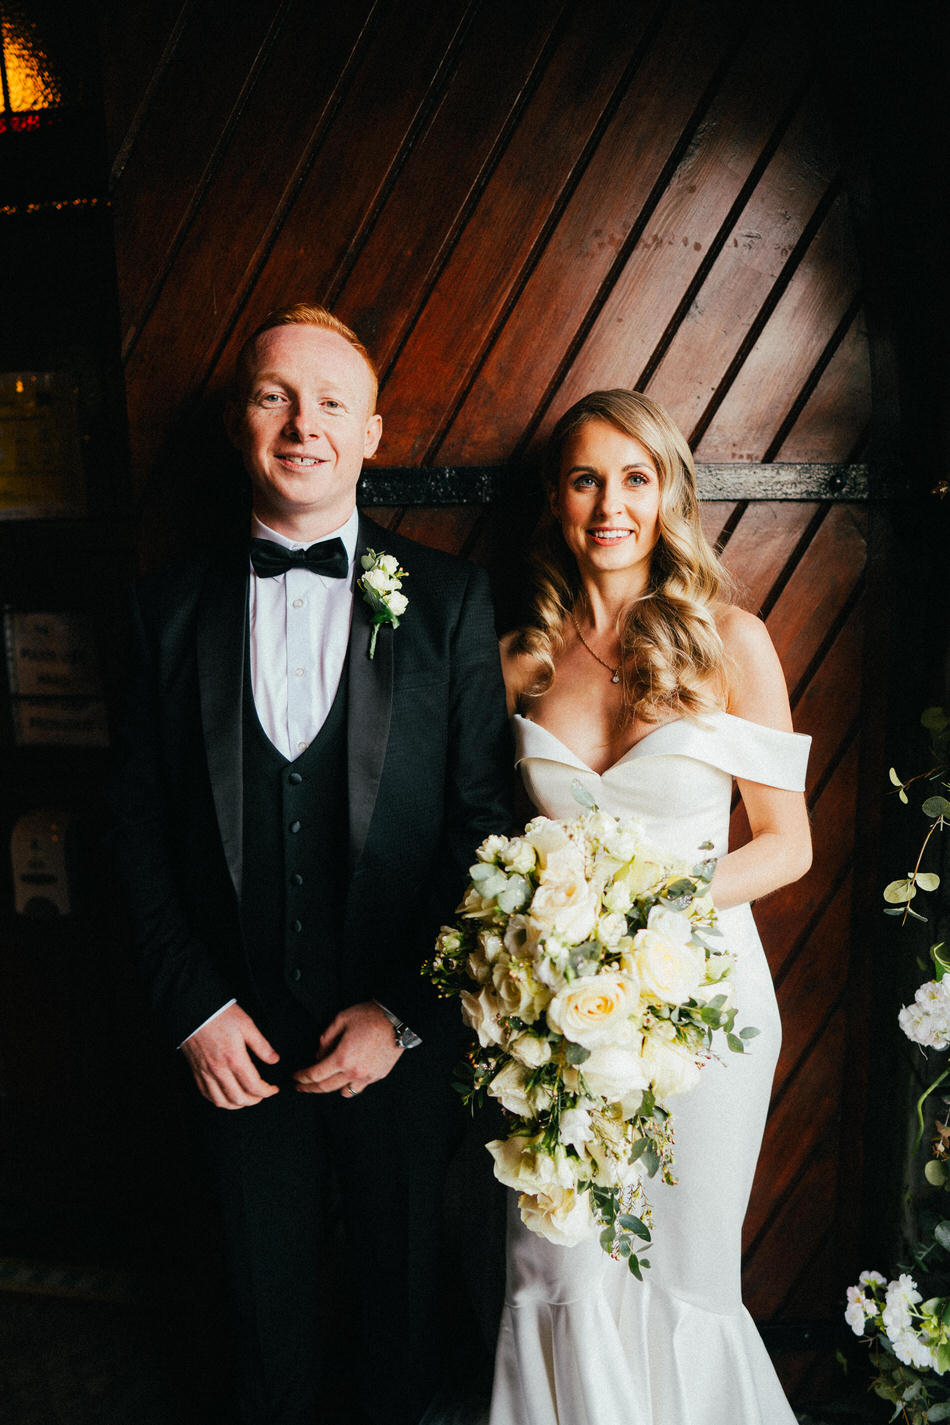 Castle-wedding-ireland-photos- 0165 115